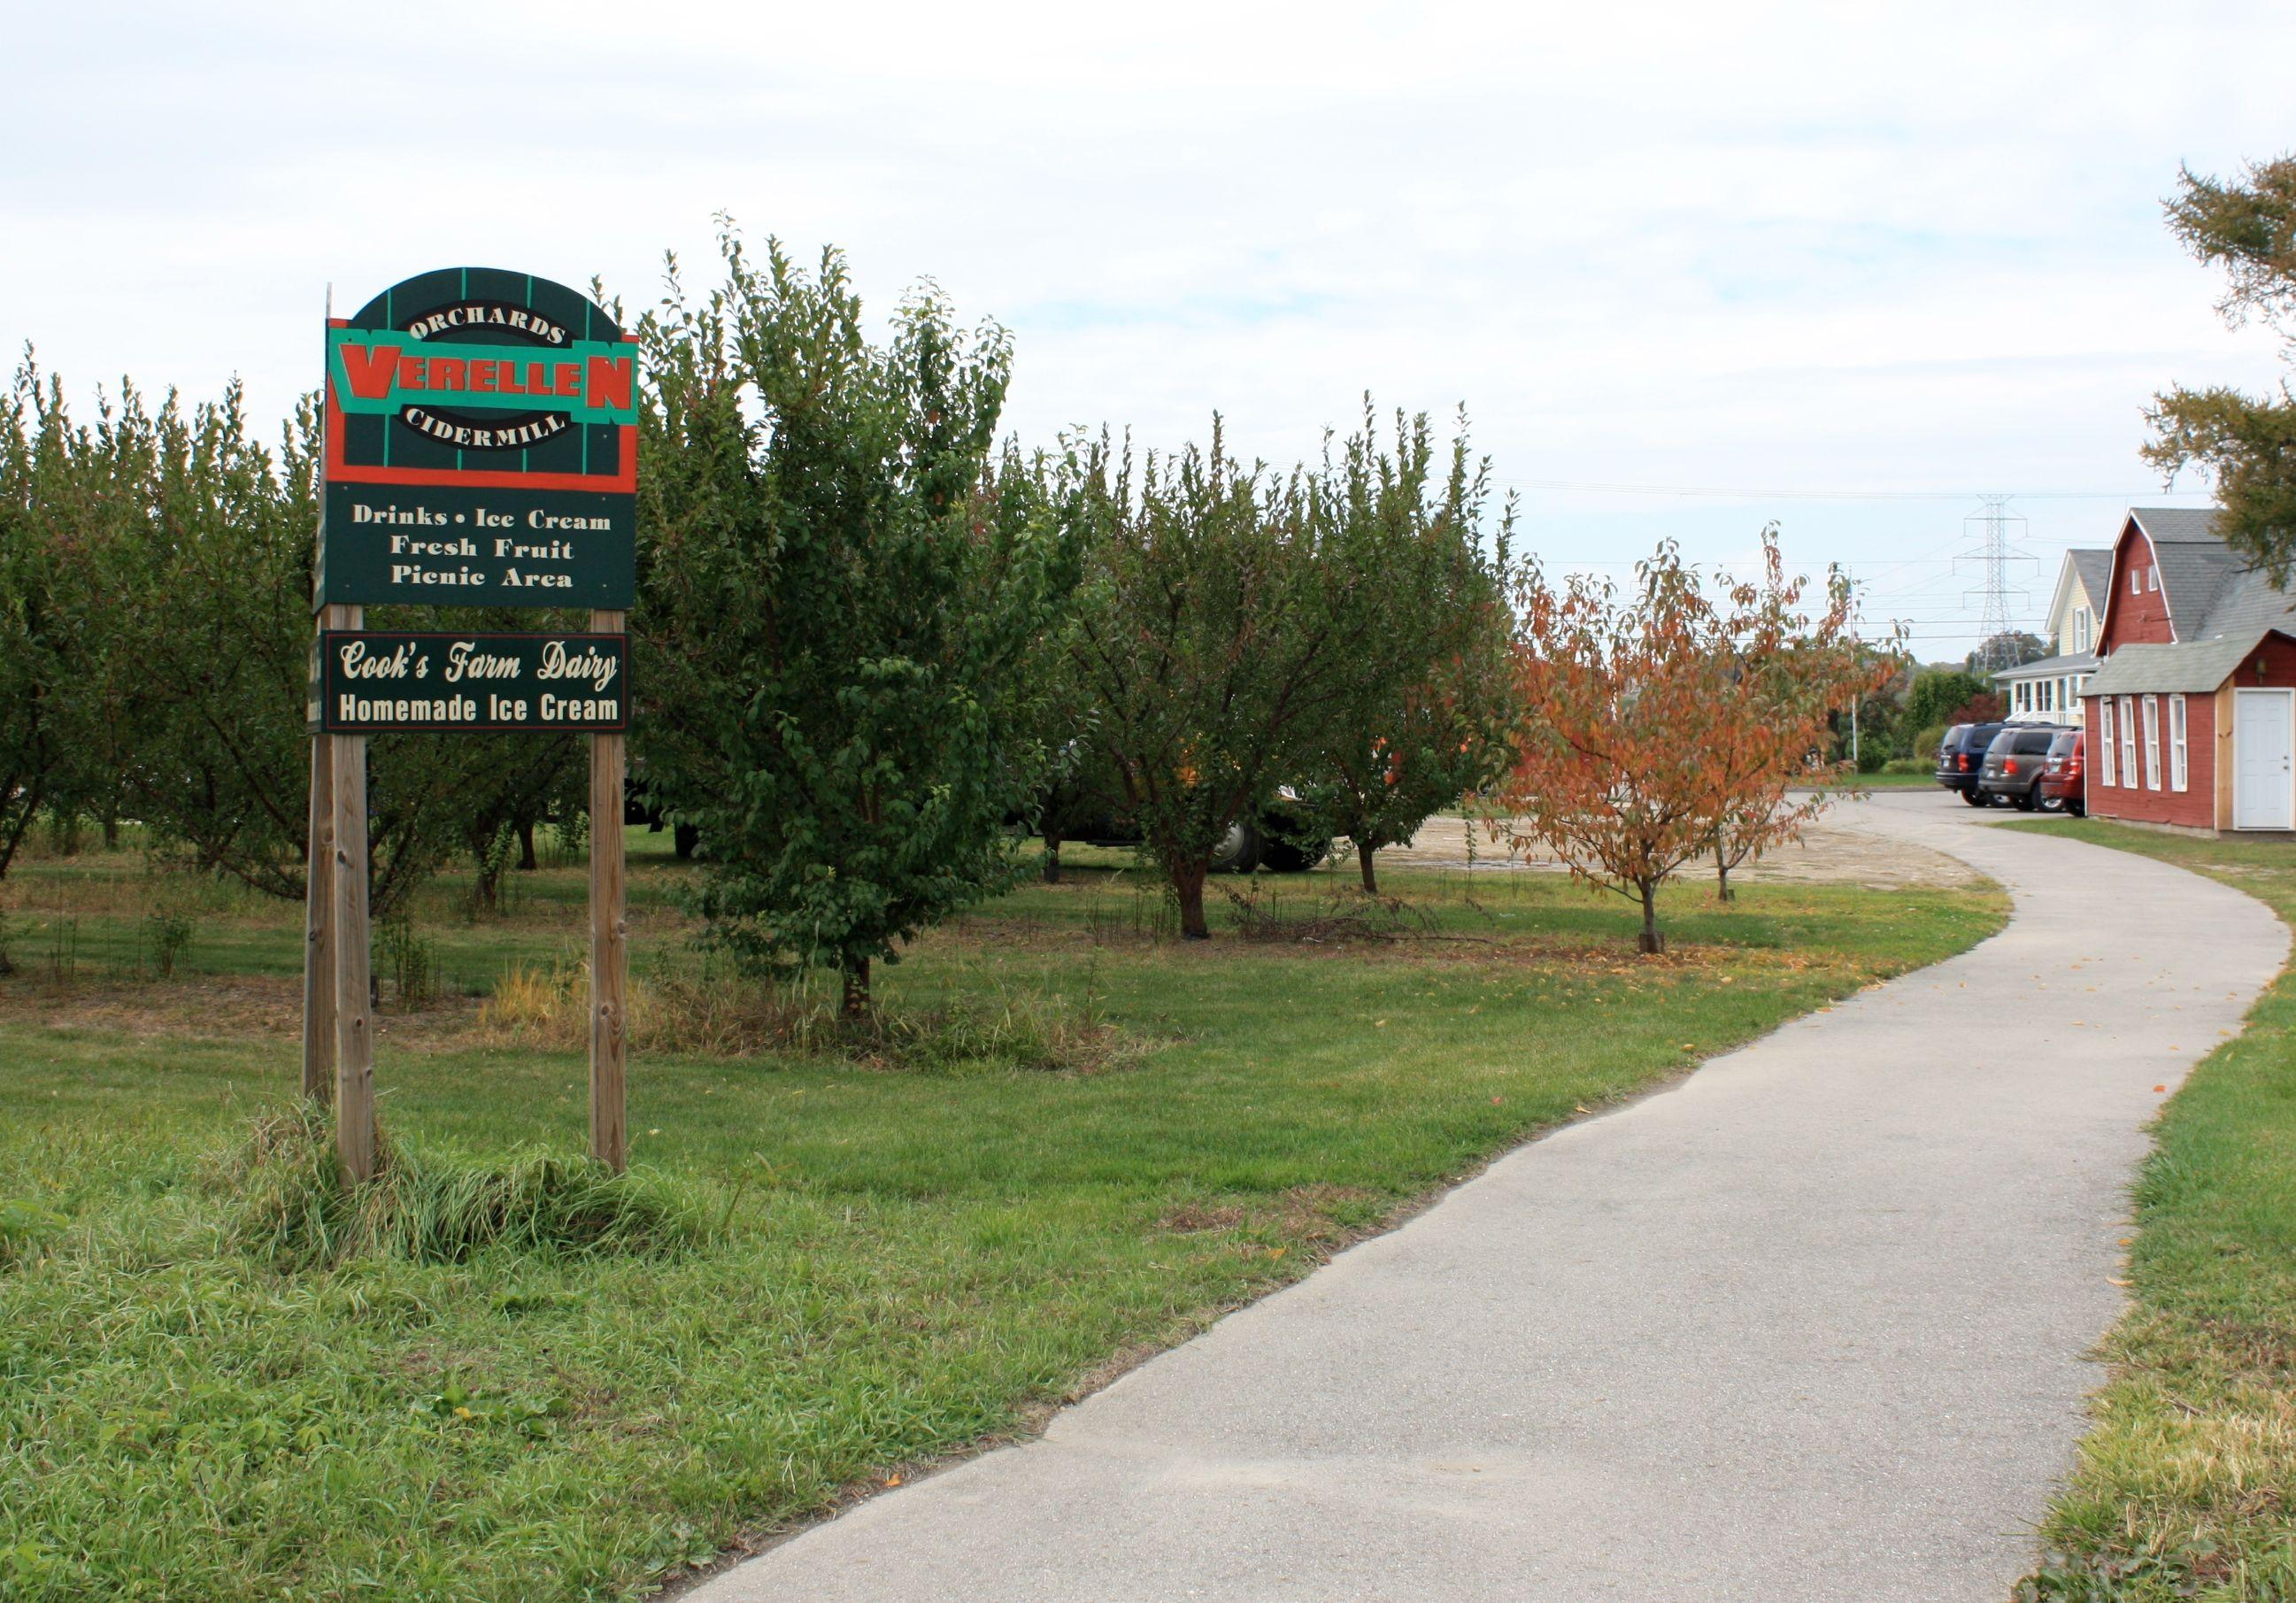 The Macomb Bike trail entrance to Verellen Orchards, Washington, MI ...